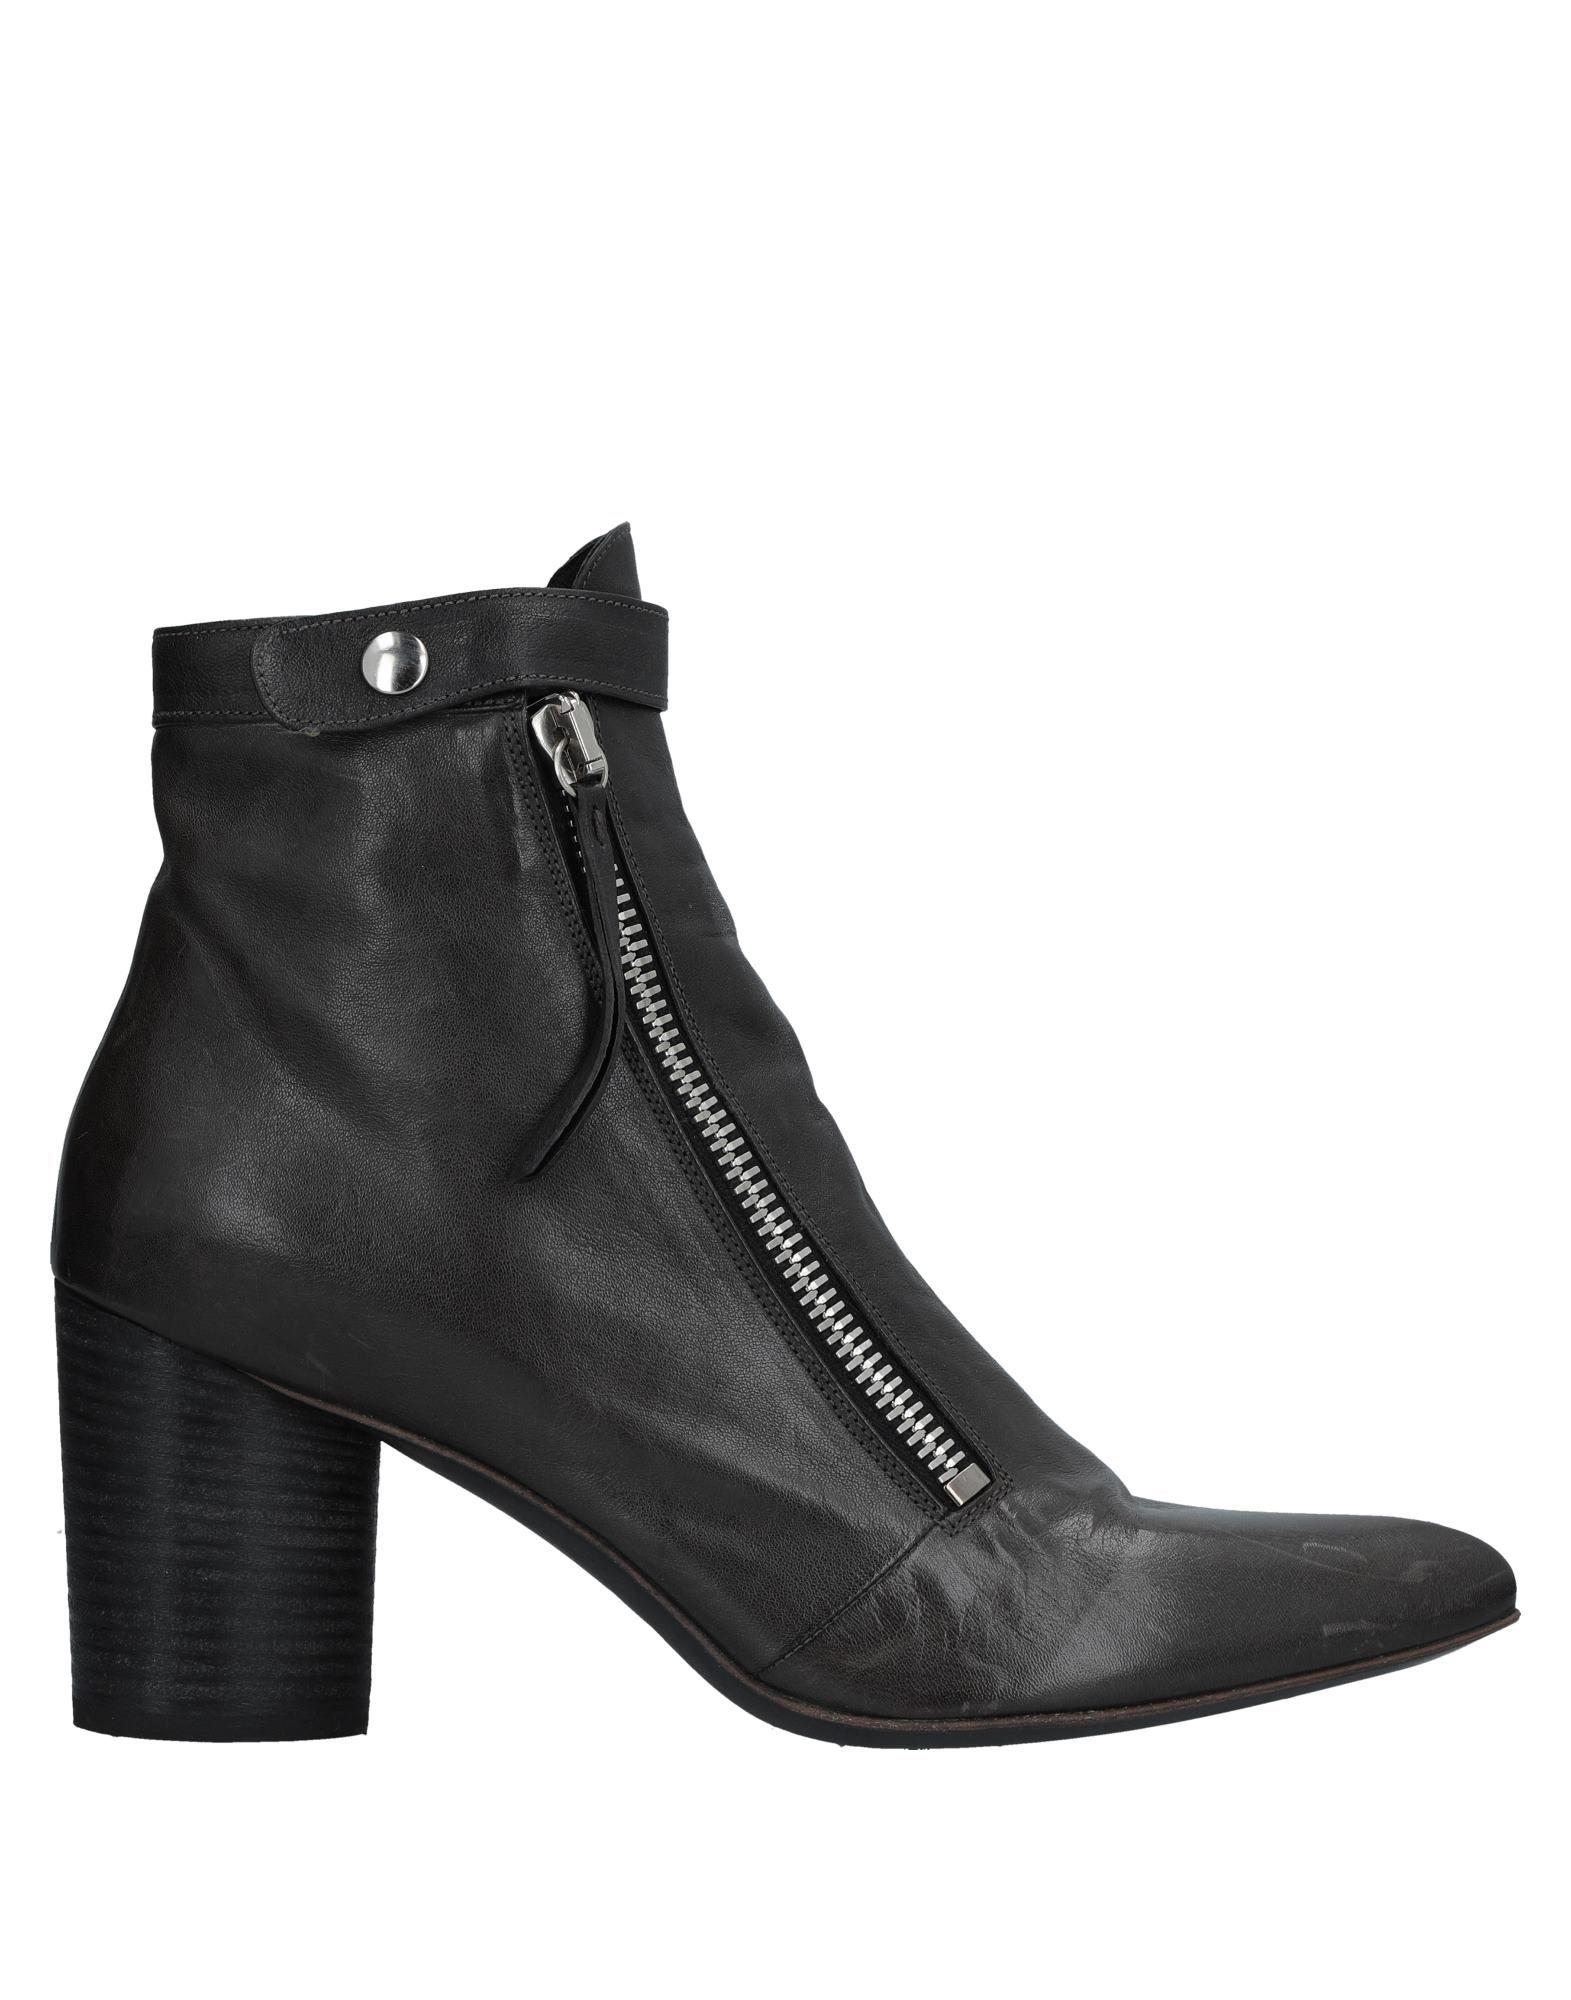 Rabatt Schuhe Premiata Stiefelette  Damen  Stiefelette 11529477OO 8955b9